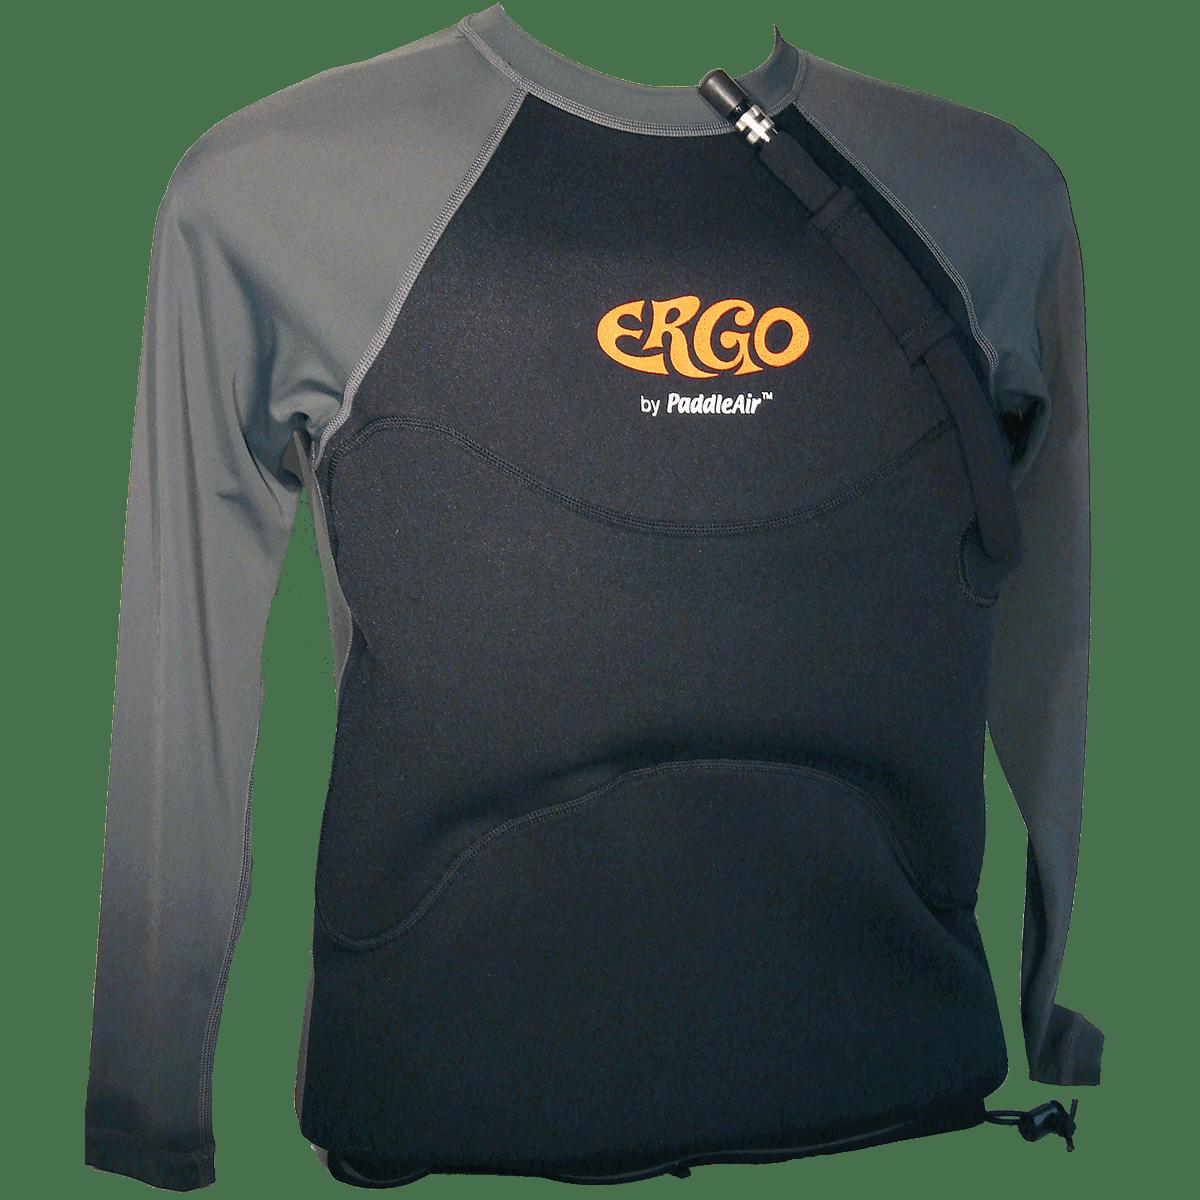 It's New: The Ergo Long Sleeve